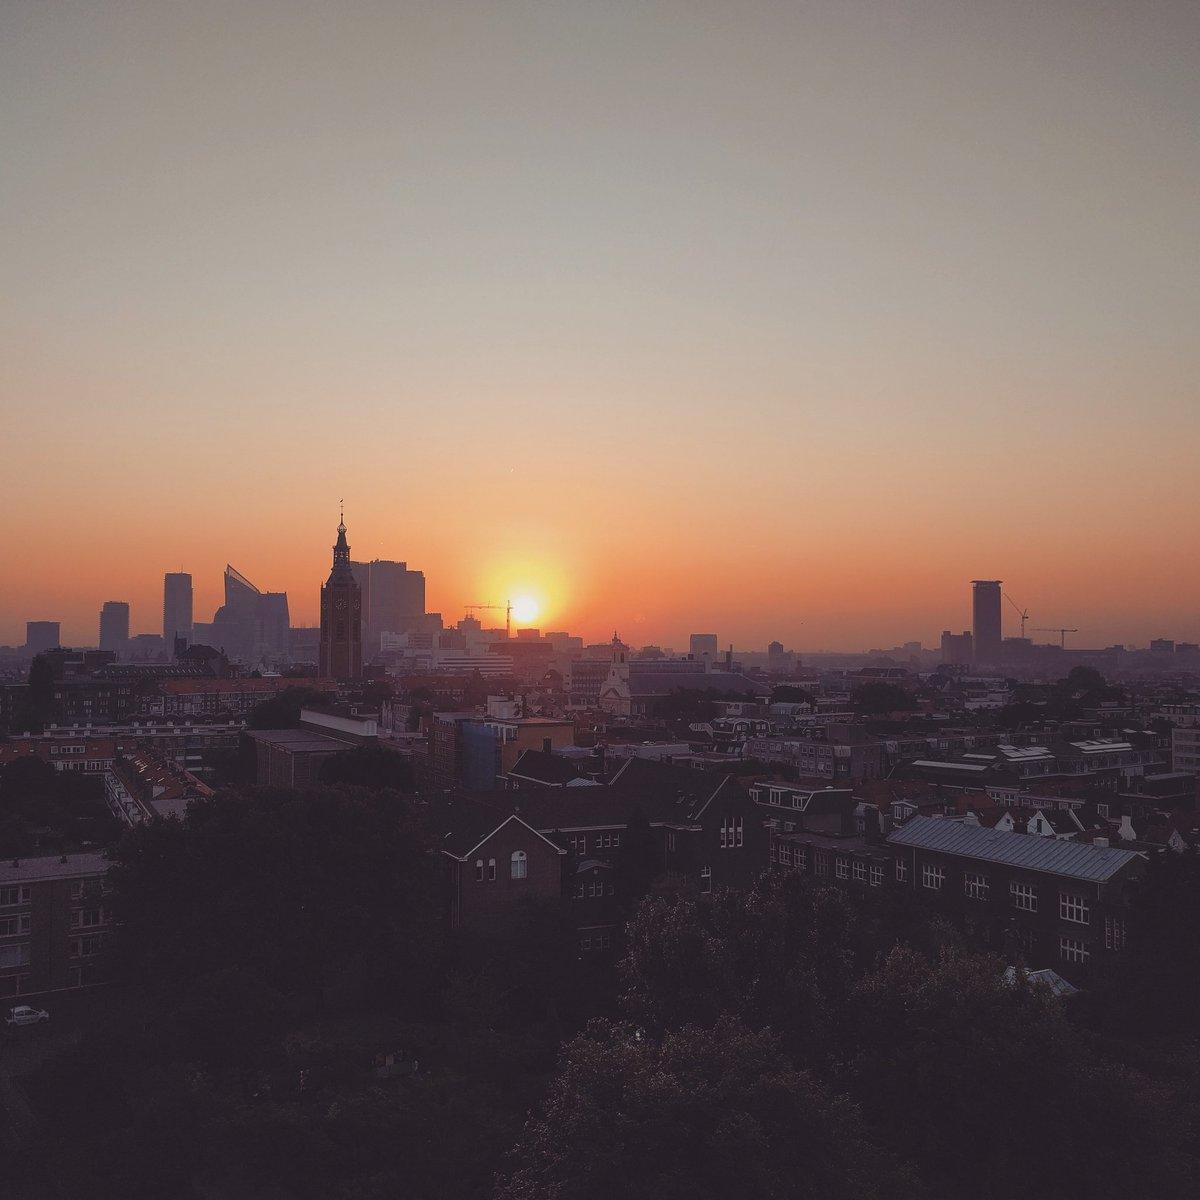 ¡buenos días The Hague #sunrise #city #TheHague #DenHaag #skyline #morning #Holland #phonephotography #photography https://t.co/L0rrt4FdSQ